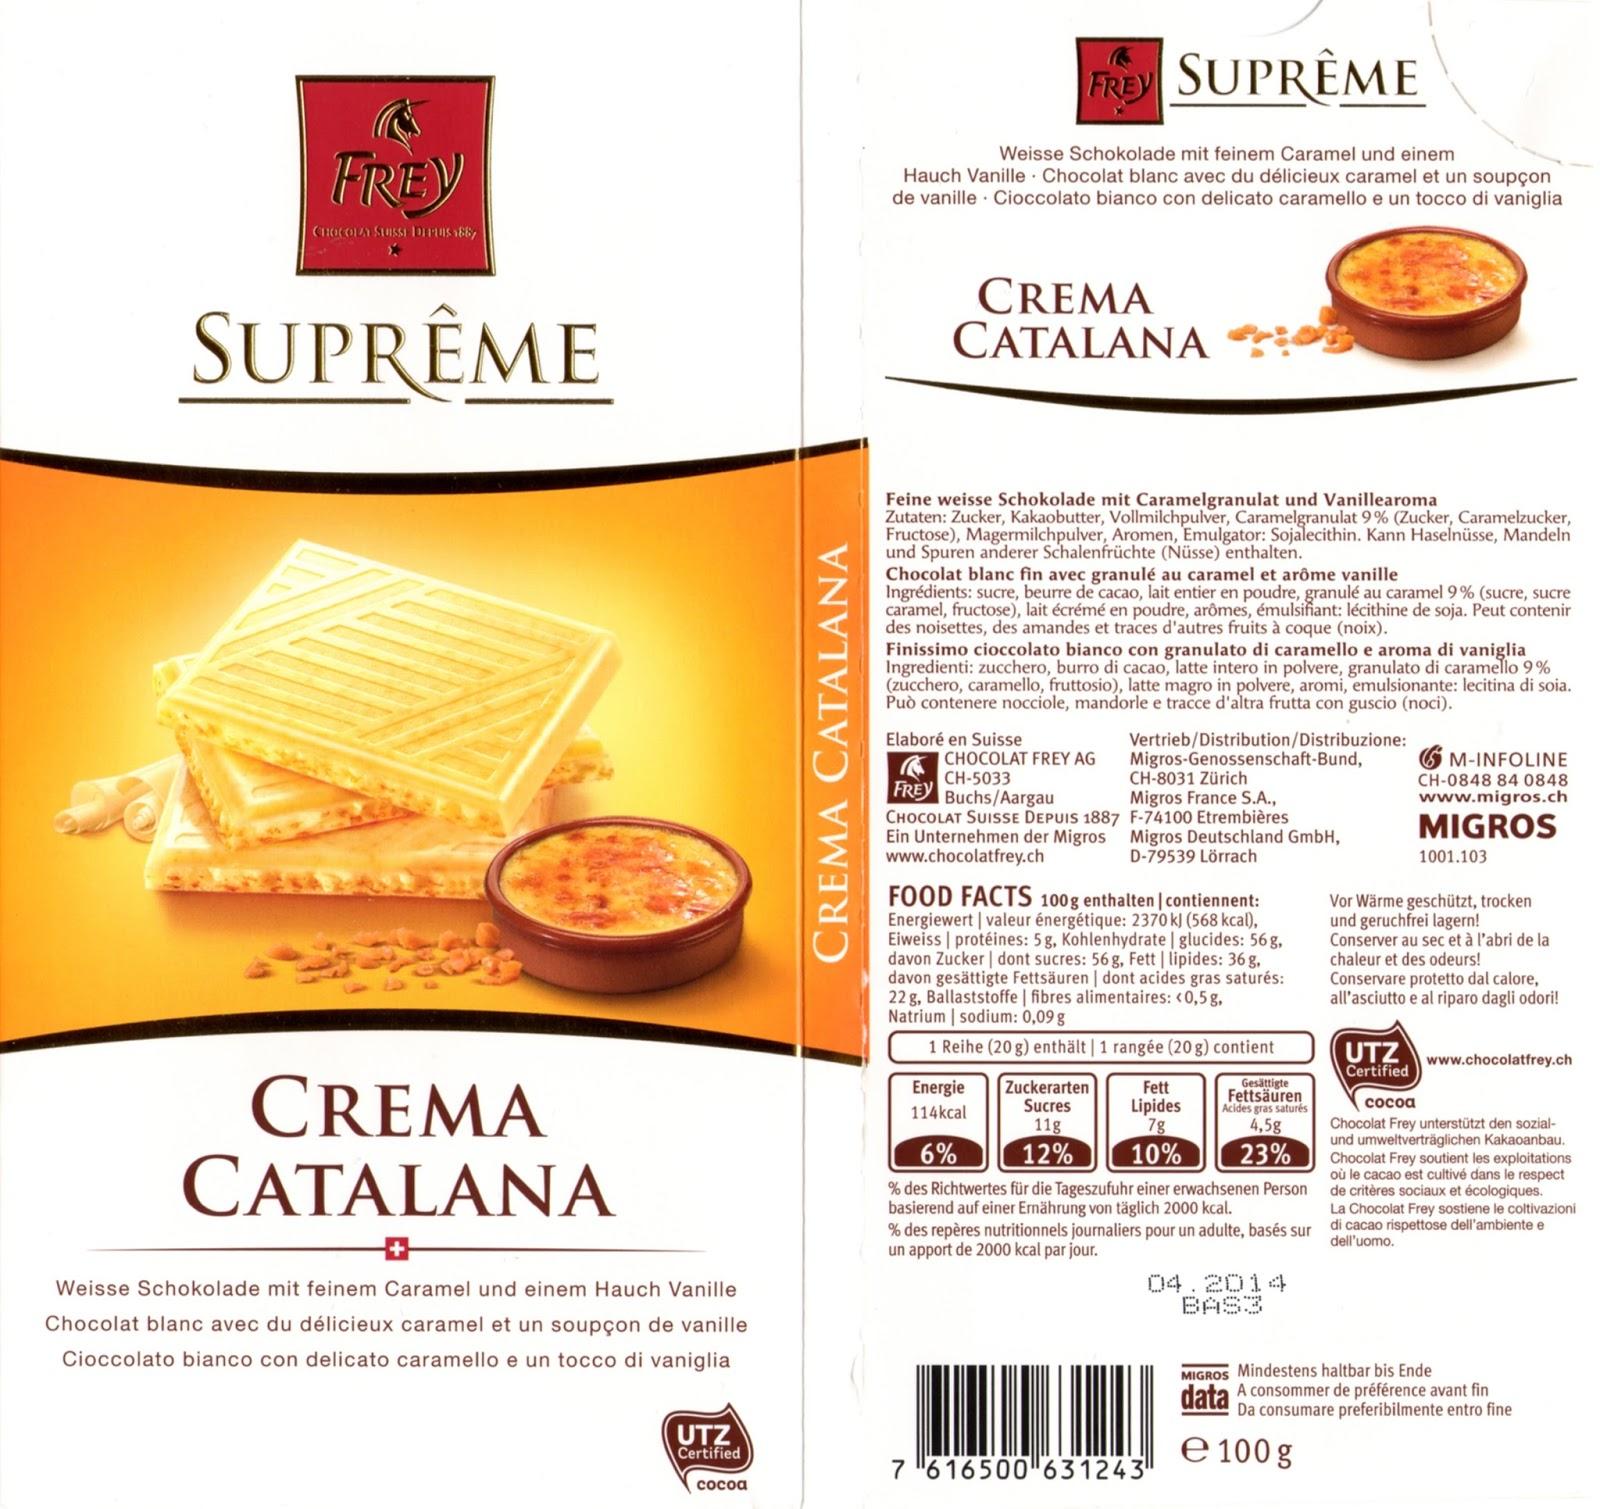 tablette de chocolat blanc fourré frey suprême crema catalana crème brûlée